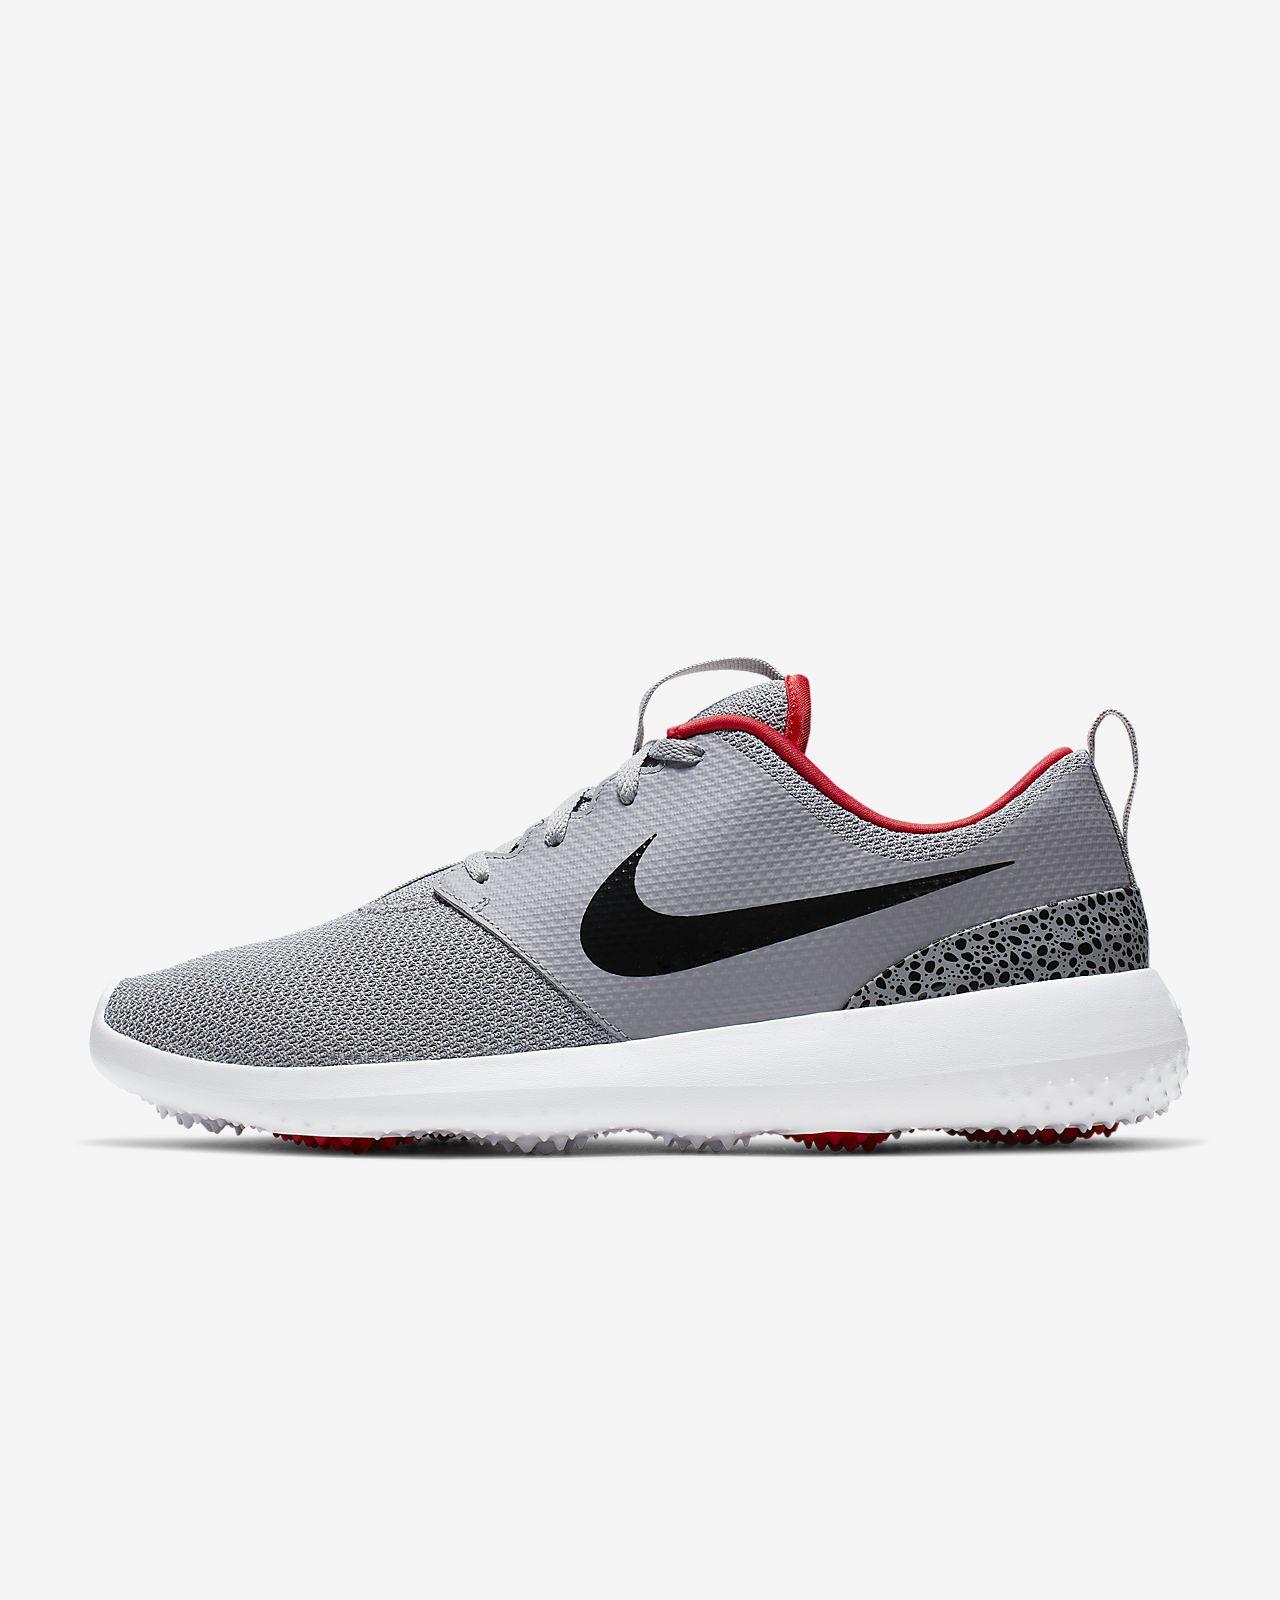 Chaussure de golf Nike Roshe G pour Homme